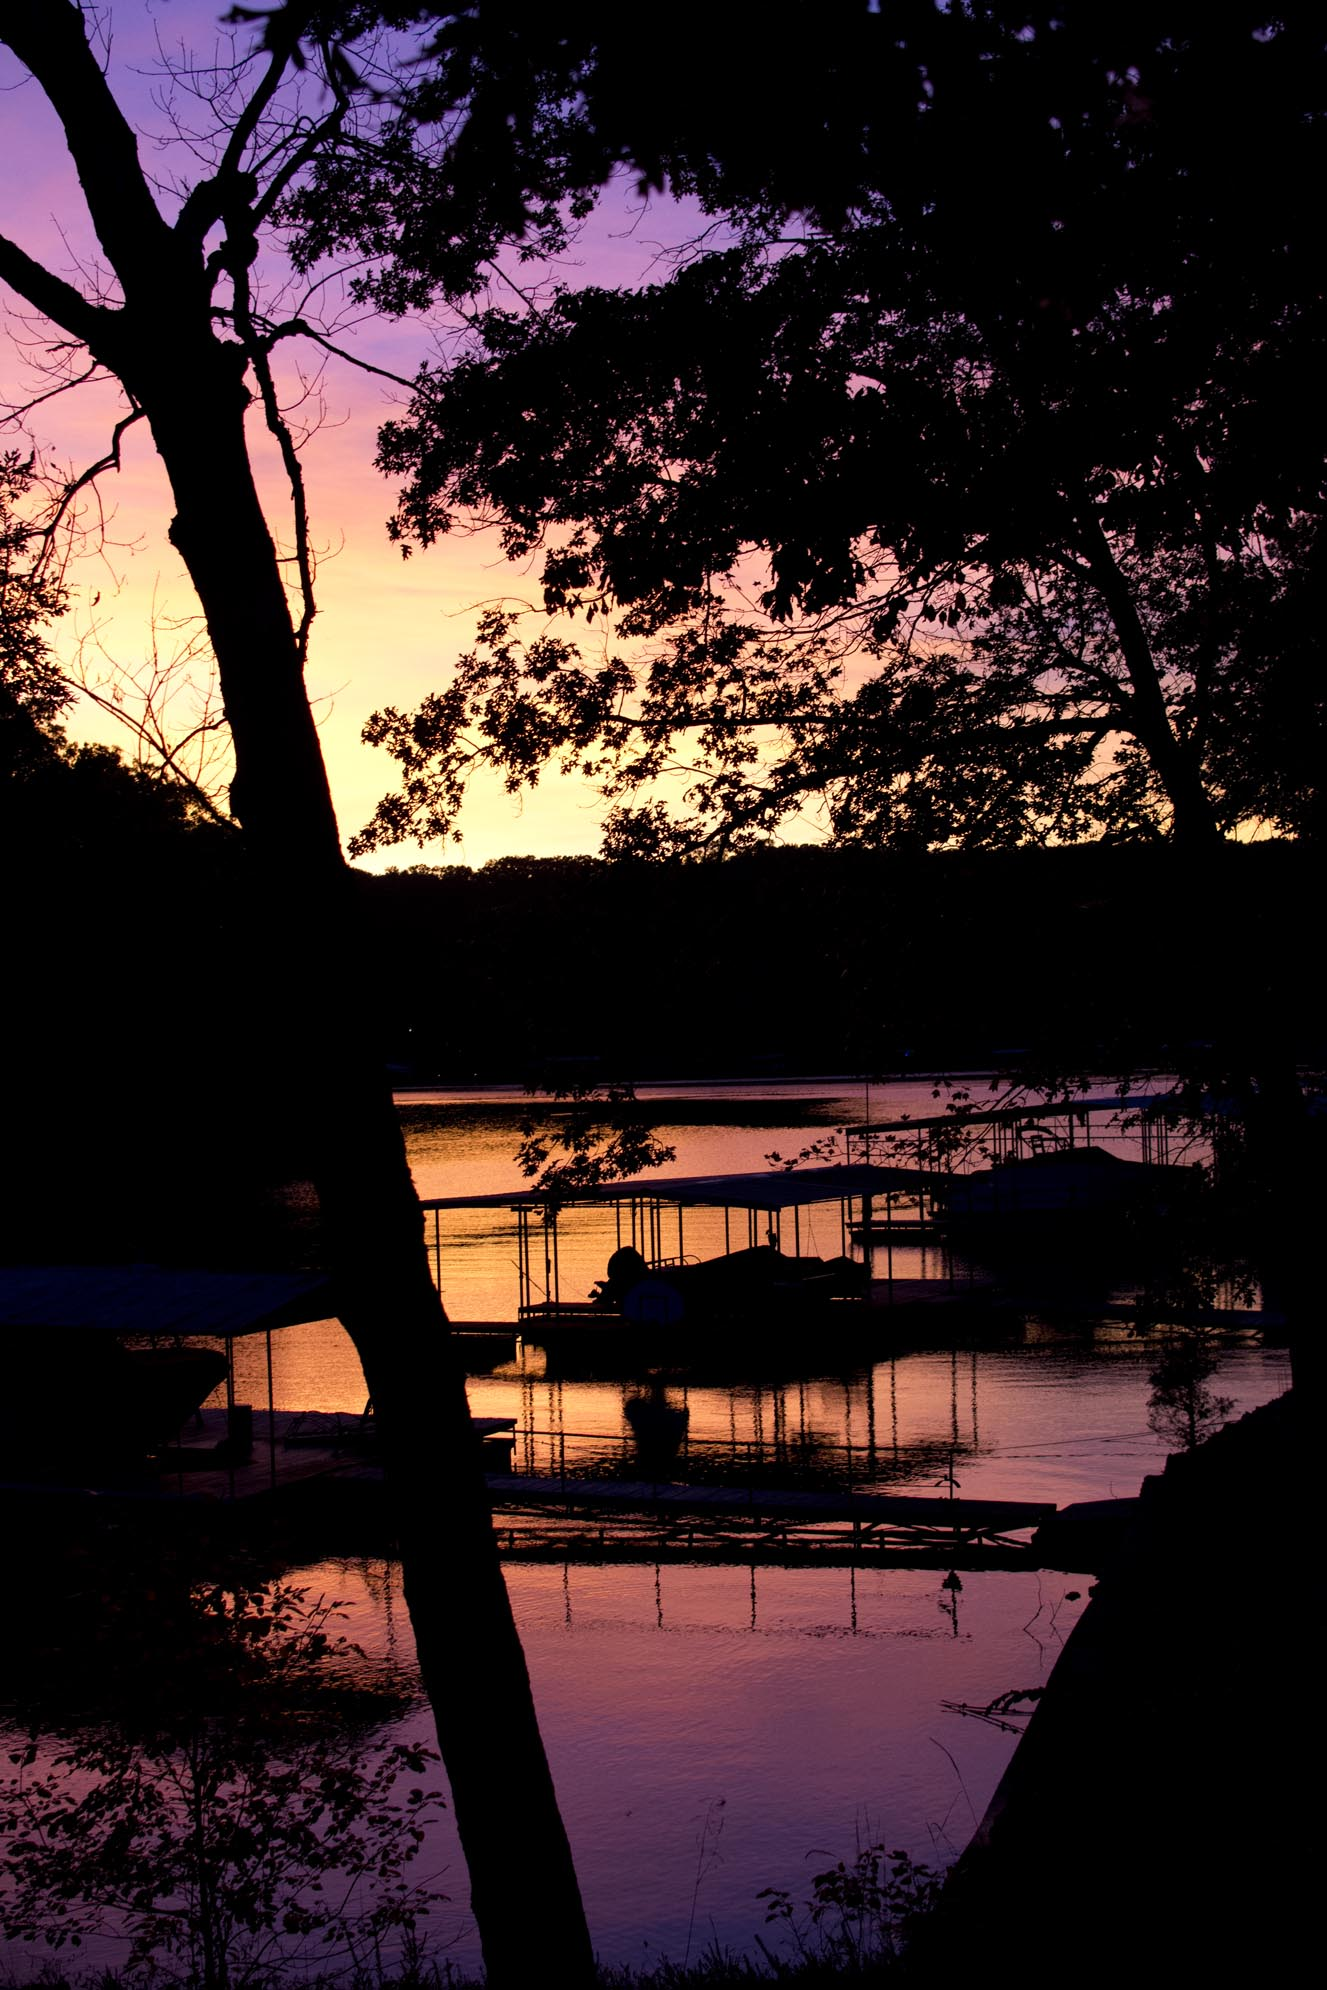 sunset1_lakehouse_10-10-15.jpg